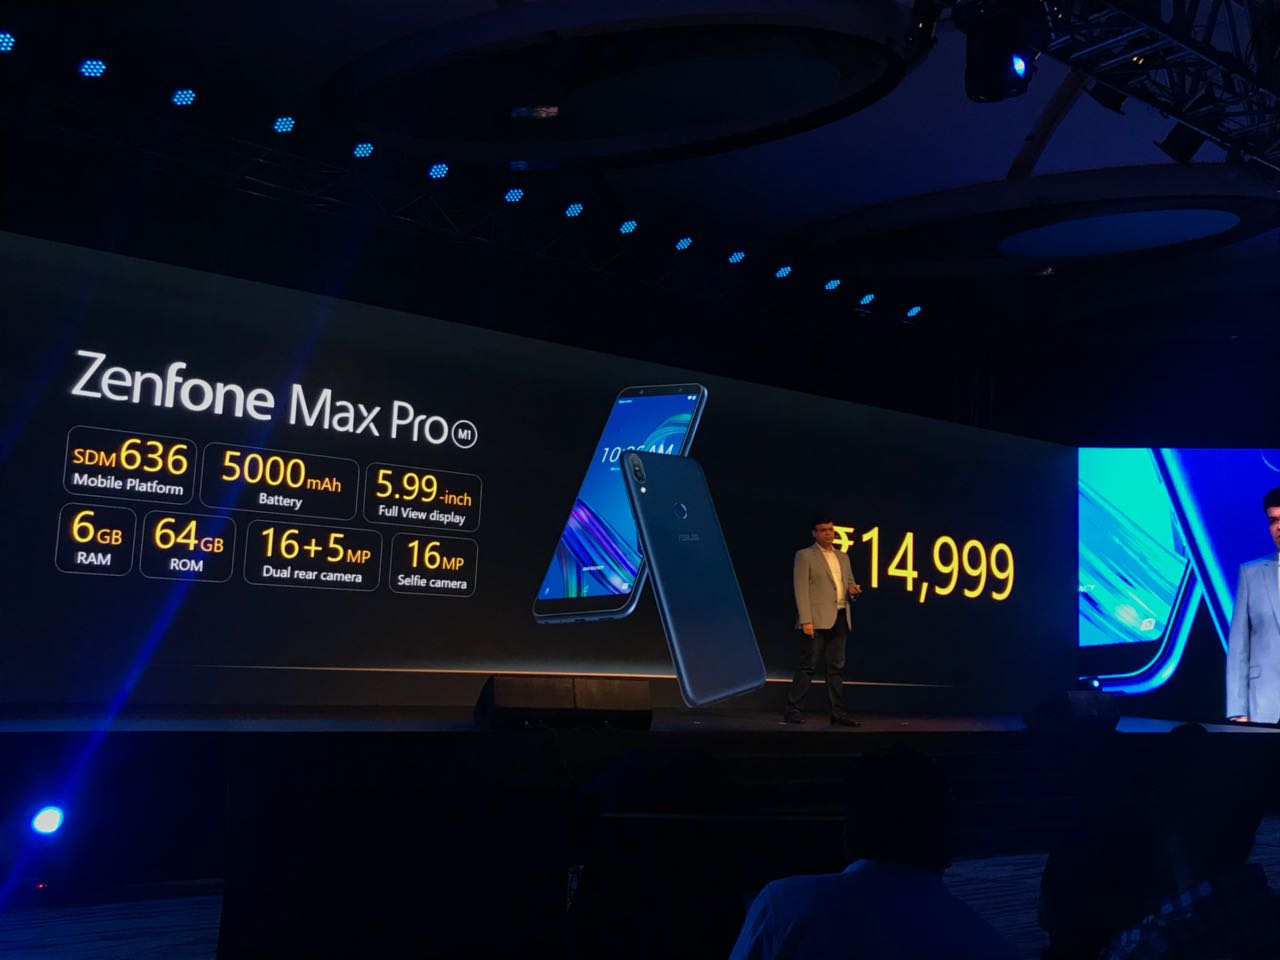 6GB RAM variant of Asus Zenfone Max Pro M1 shows up on Flipkart 1